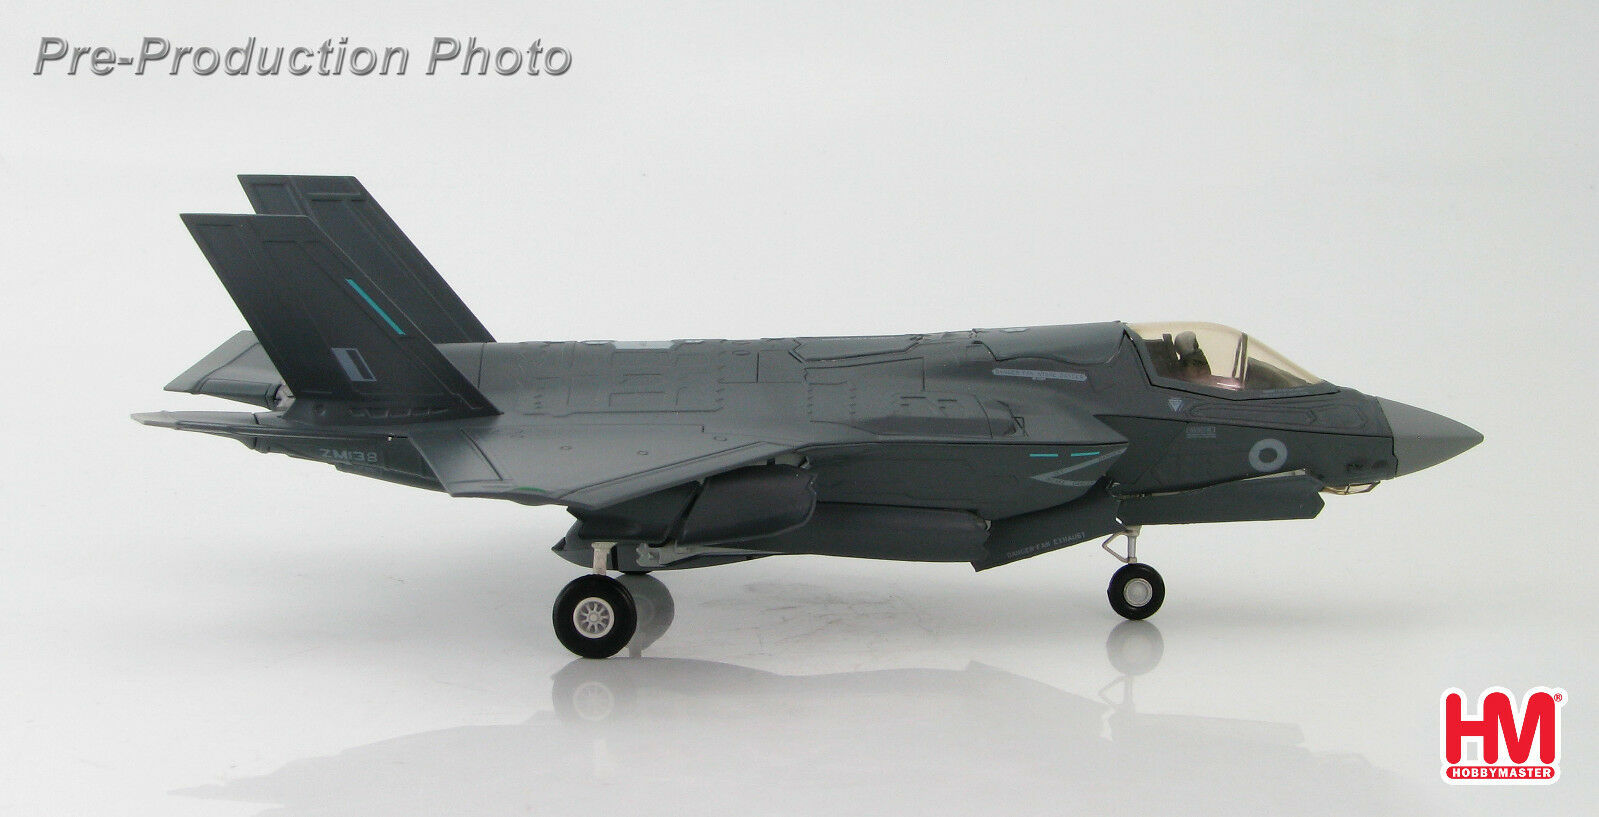 oferta especial Hobby Master HA4607 1 72 Lockheed Martin F-35B Lightning Ii Ii Ii ZM138, roya  buen precio